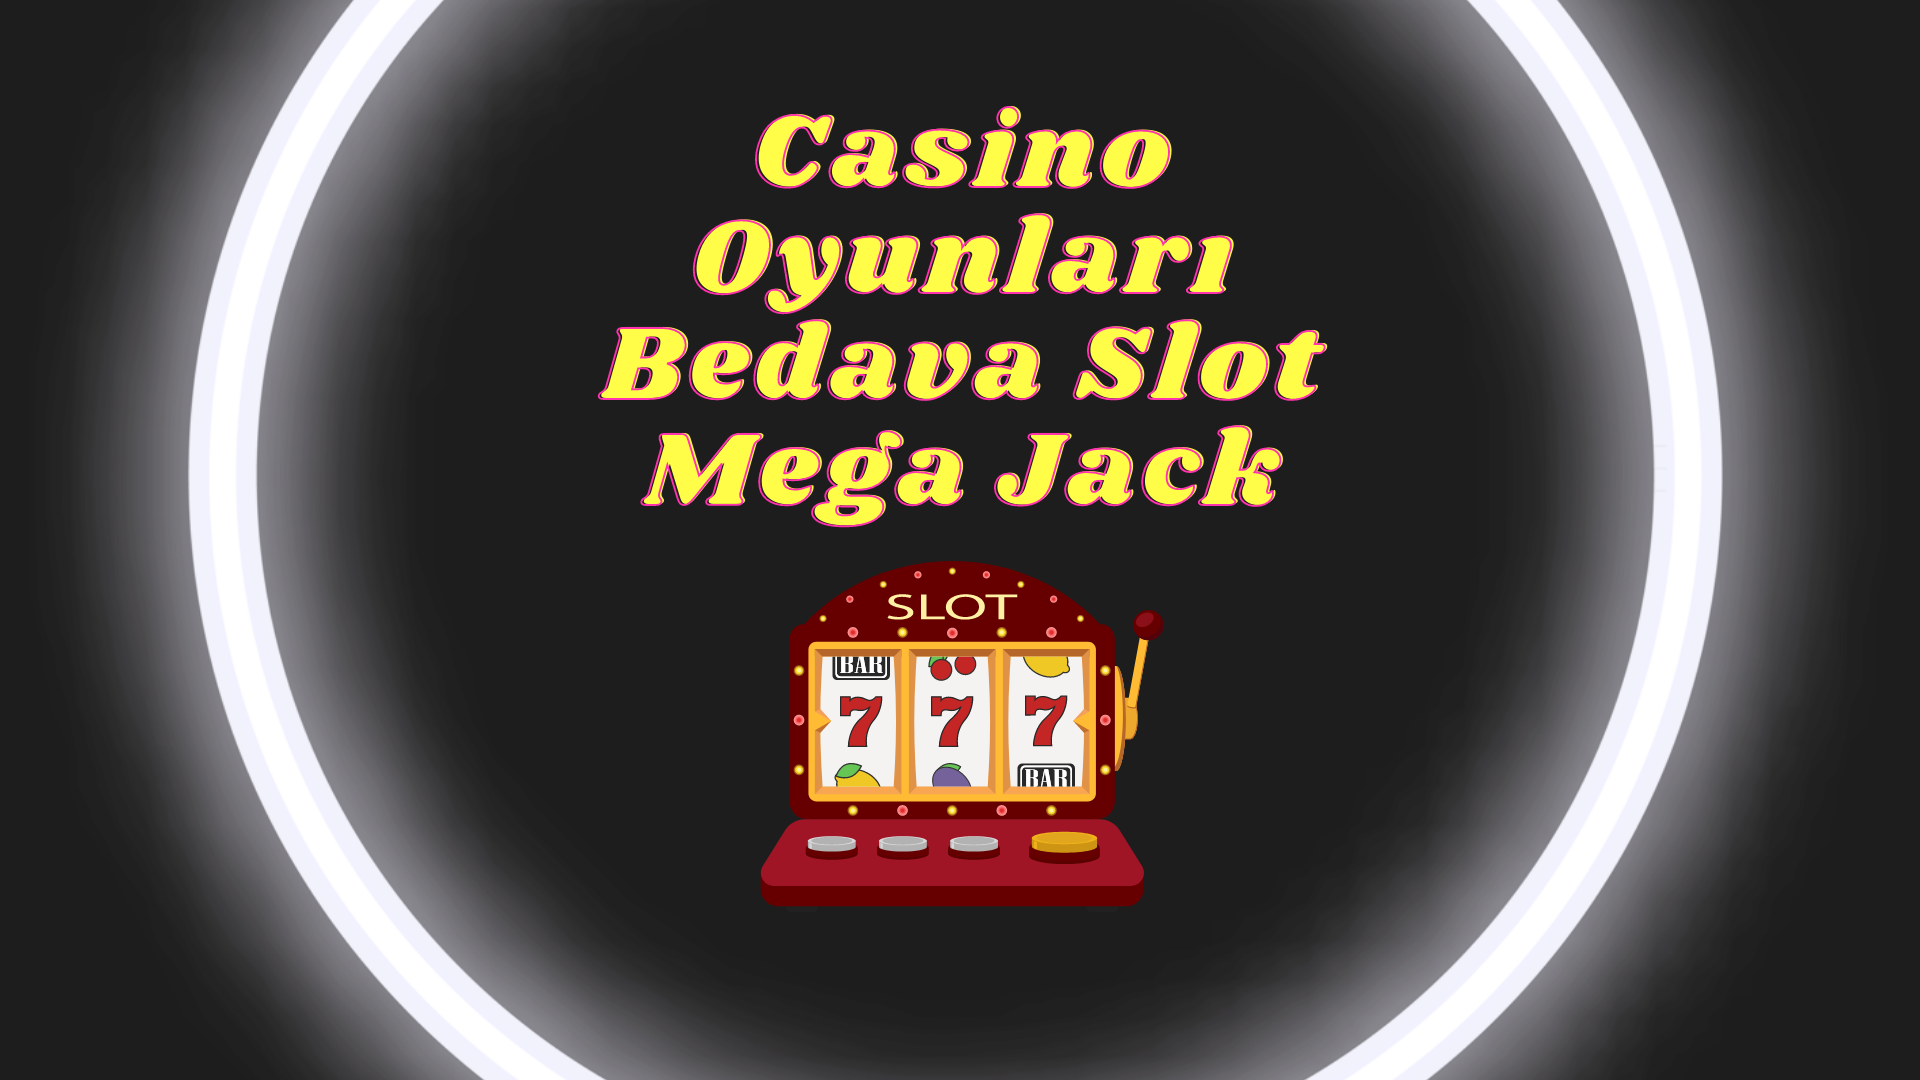 Casino Oyunları Bedava Slot Mega Jack